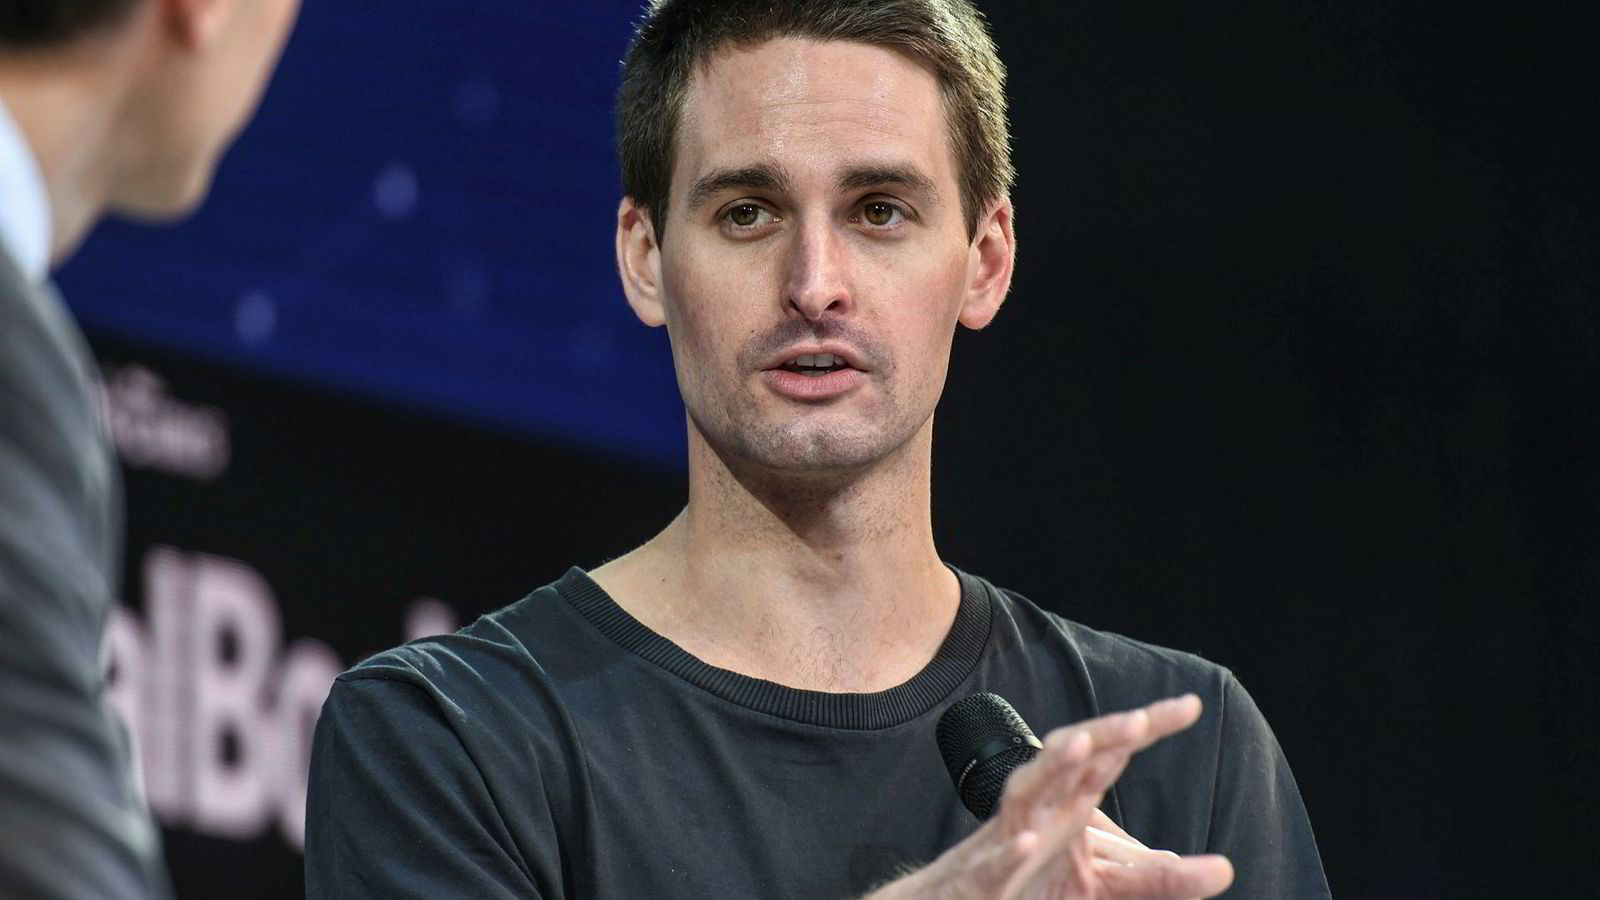 Medgründer og konsernsjef Evan Spiegel i Snap Inc. kunne endelig melde om positiv utvikling for Snapchat.